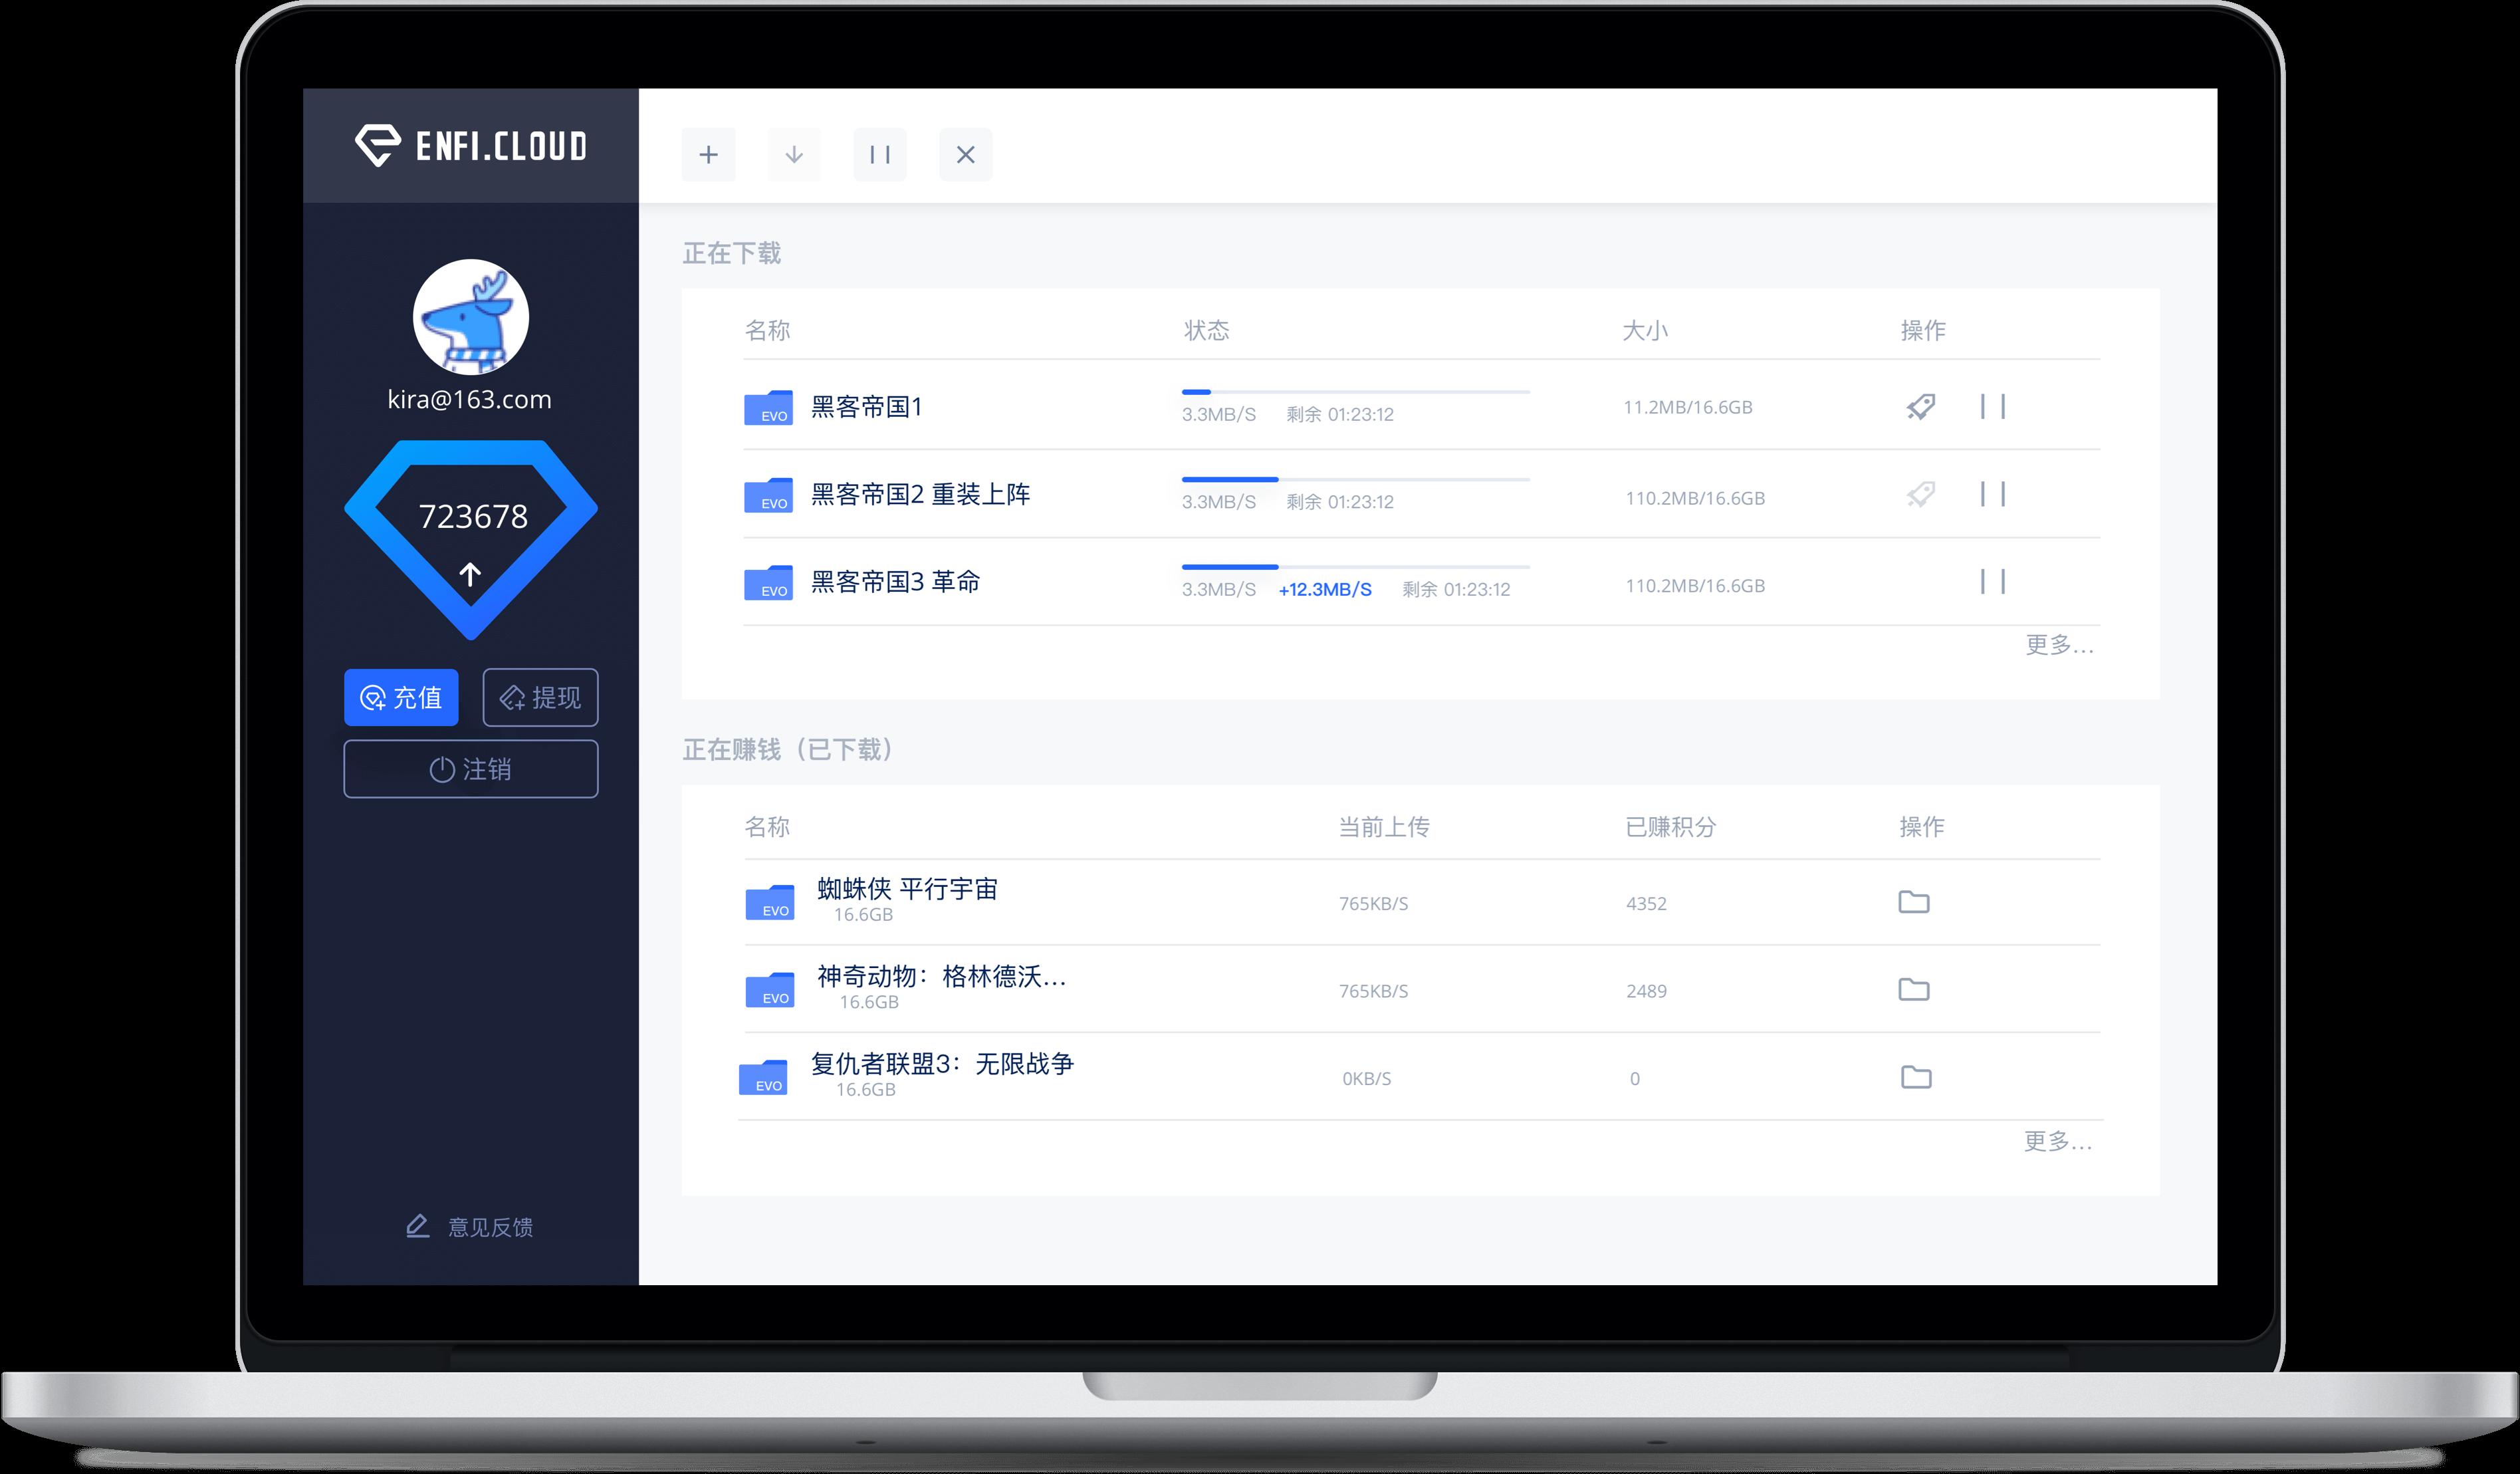 ENFI 下载器 2.0.5